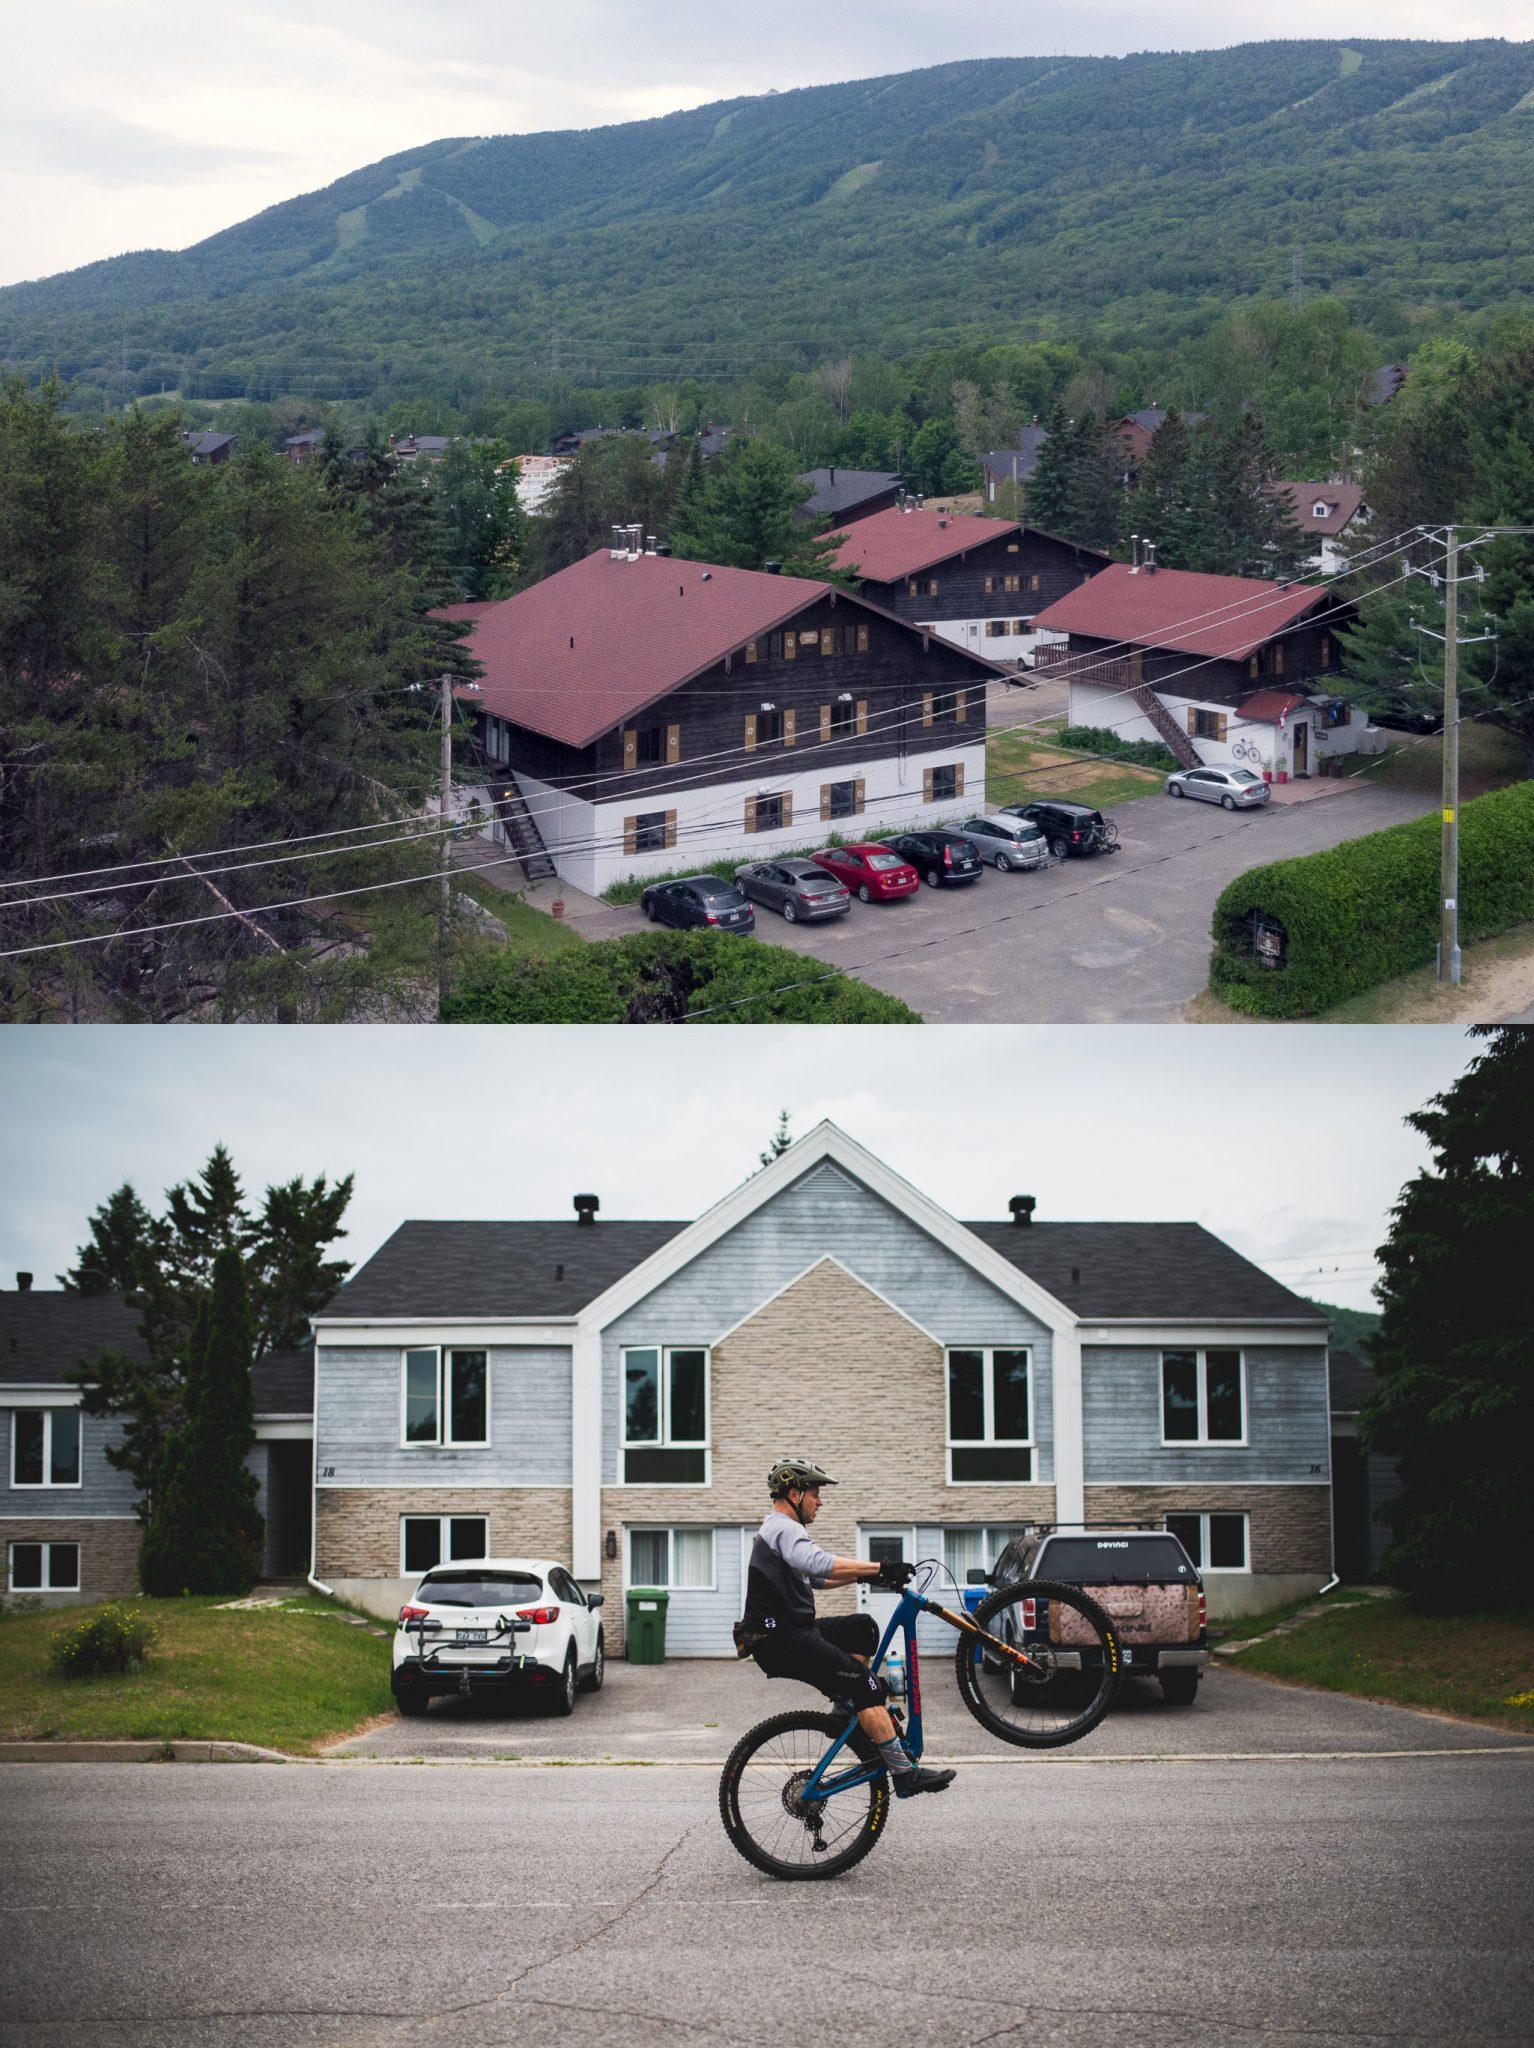 Enduro mountain biking at Villas Mont-Sainte-Anne